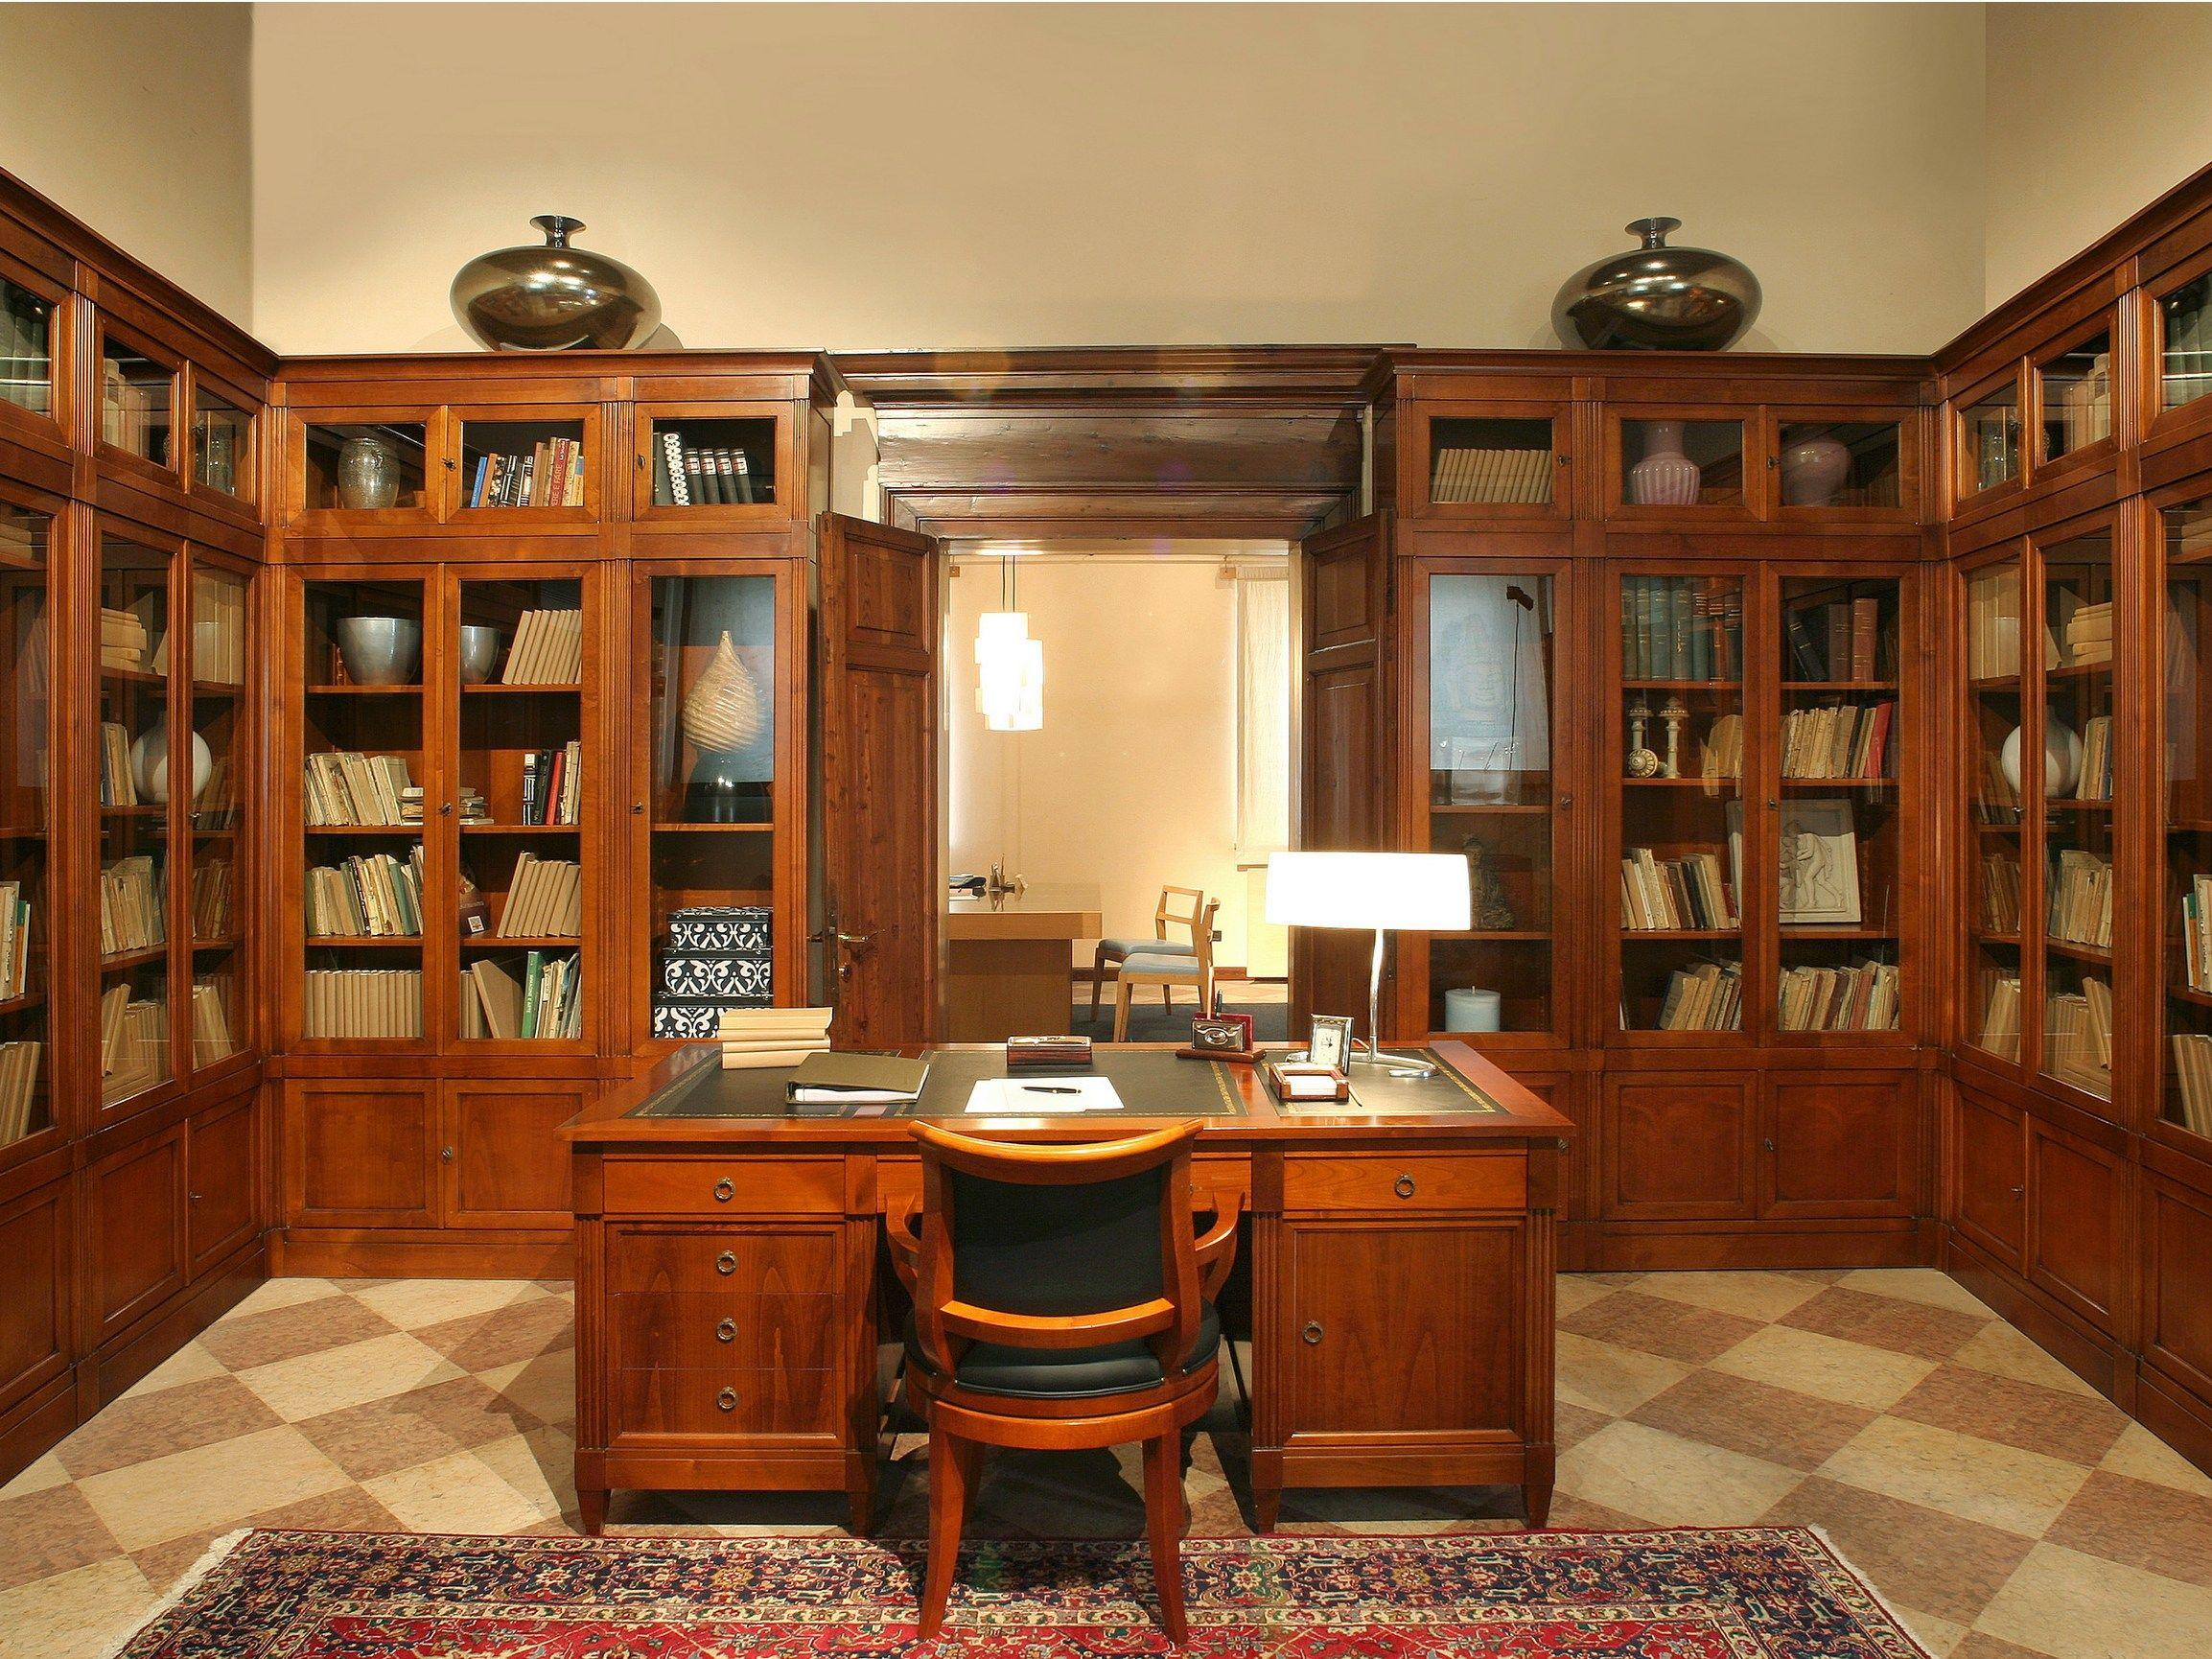 Direttorio libreria by morelato design centro ricerche maam for Morelato librerie